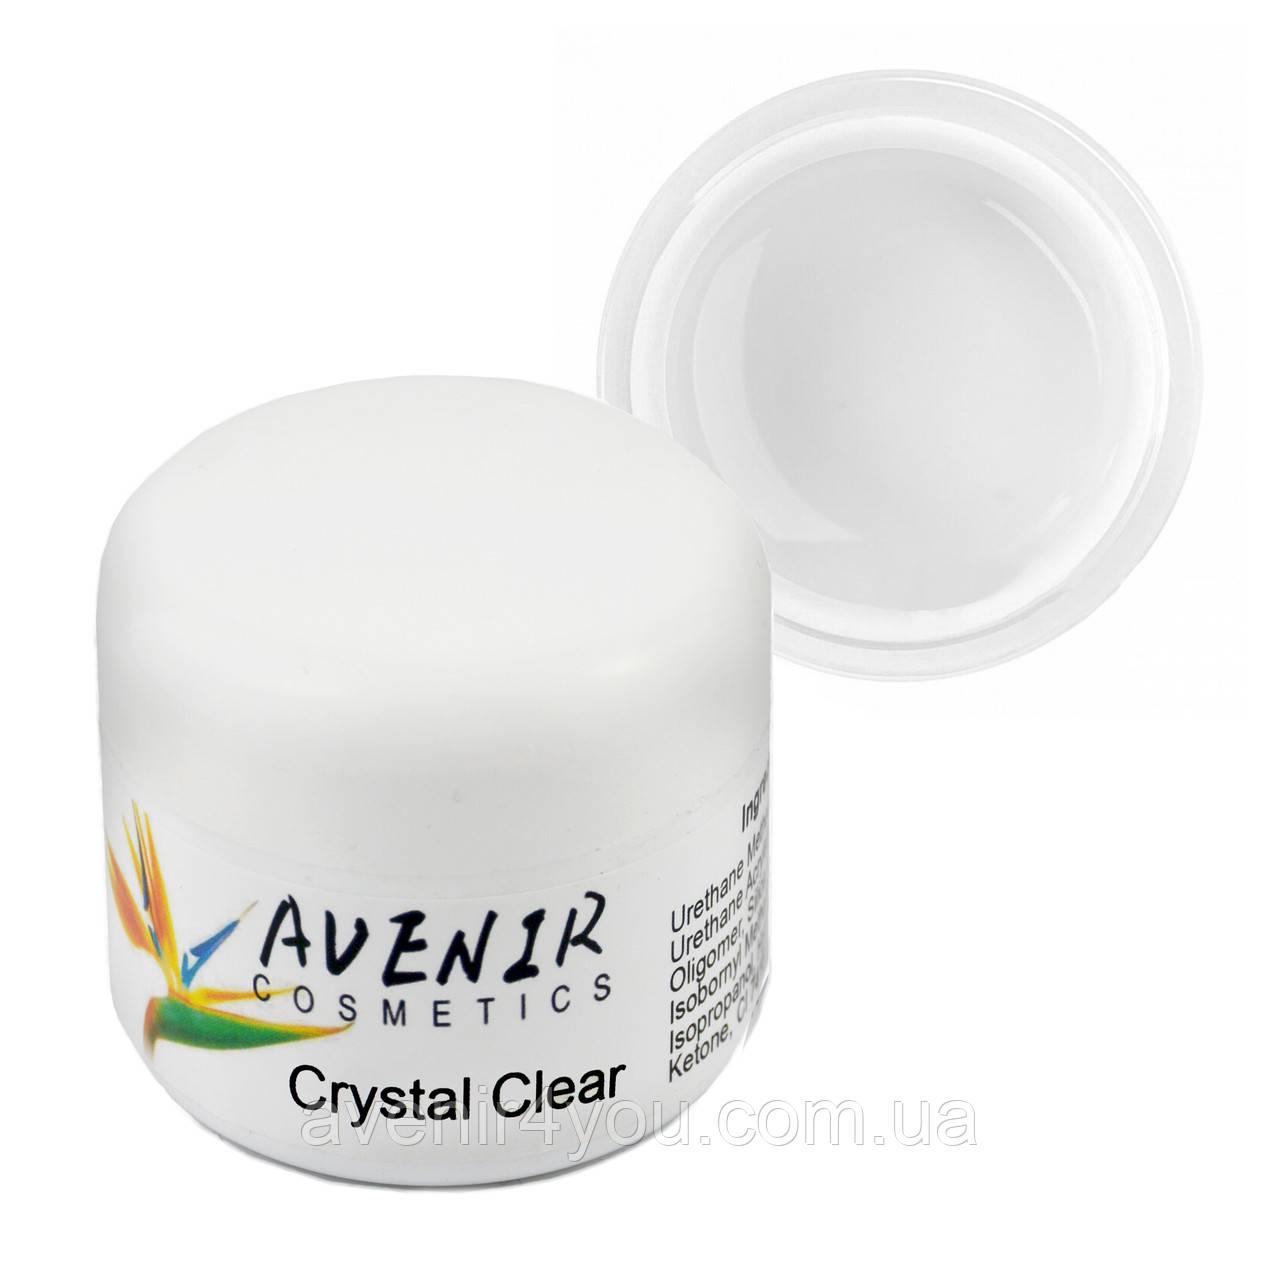 Гель для наращивания Crystal clear Avenir 50 мл